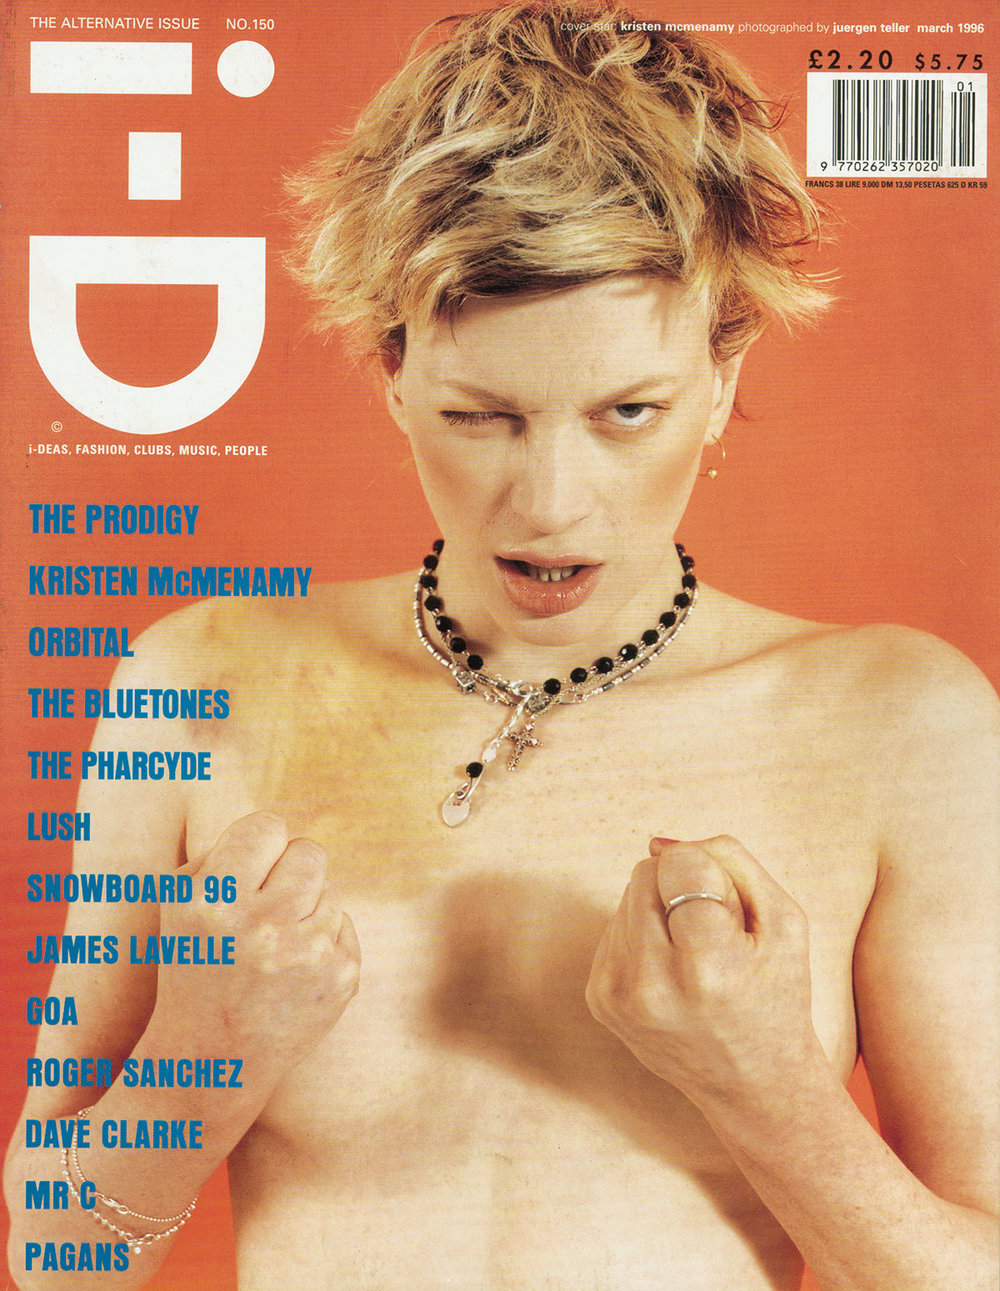 edward-enninfuls-greatest-i-d-covers-body-image-1416925855.jpg